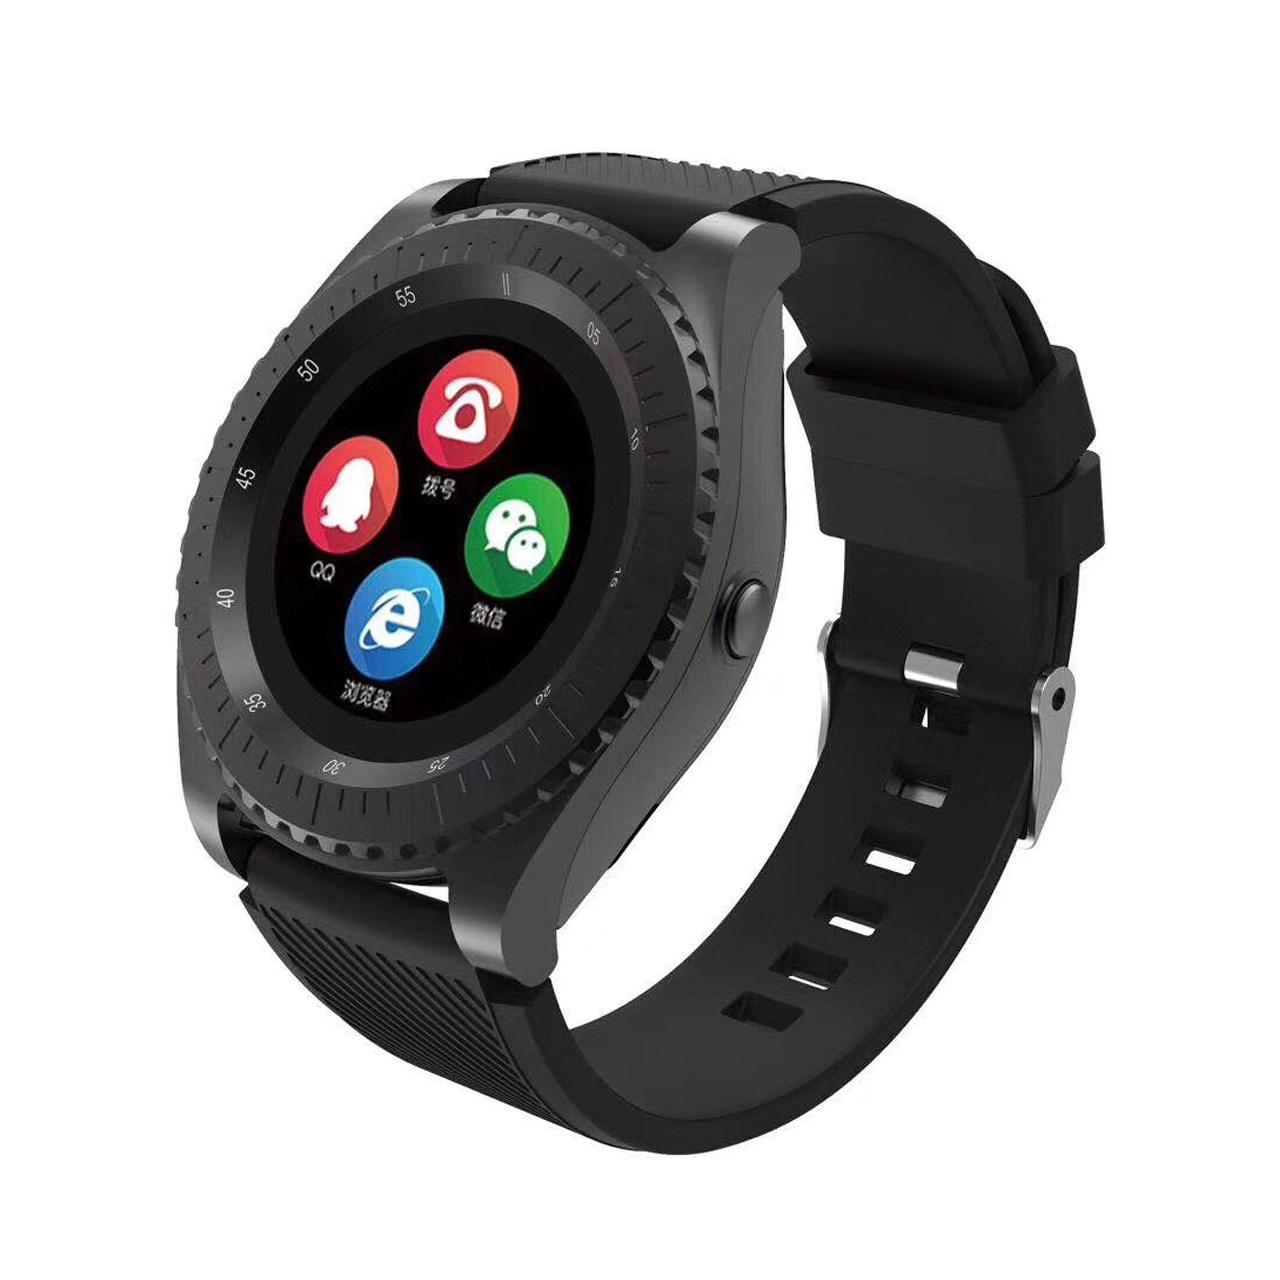 ساعت مچی هوشمند مدل Z3